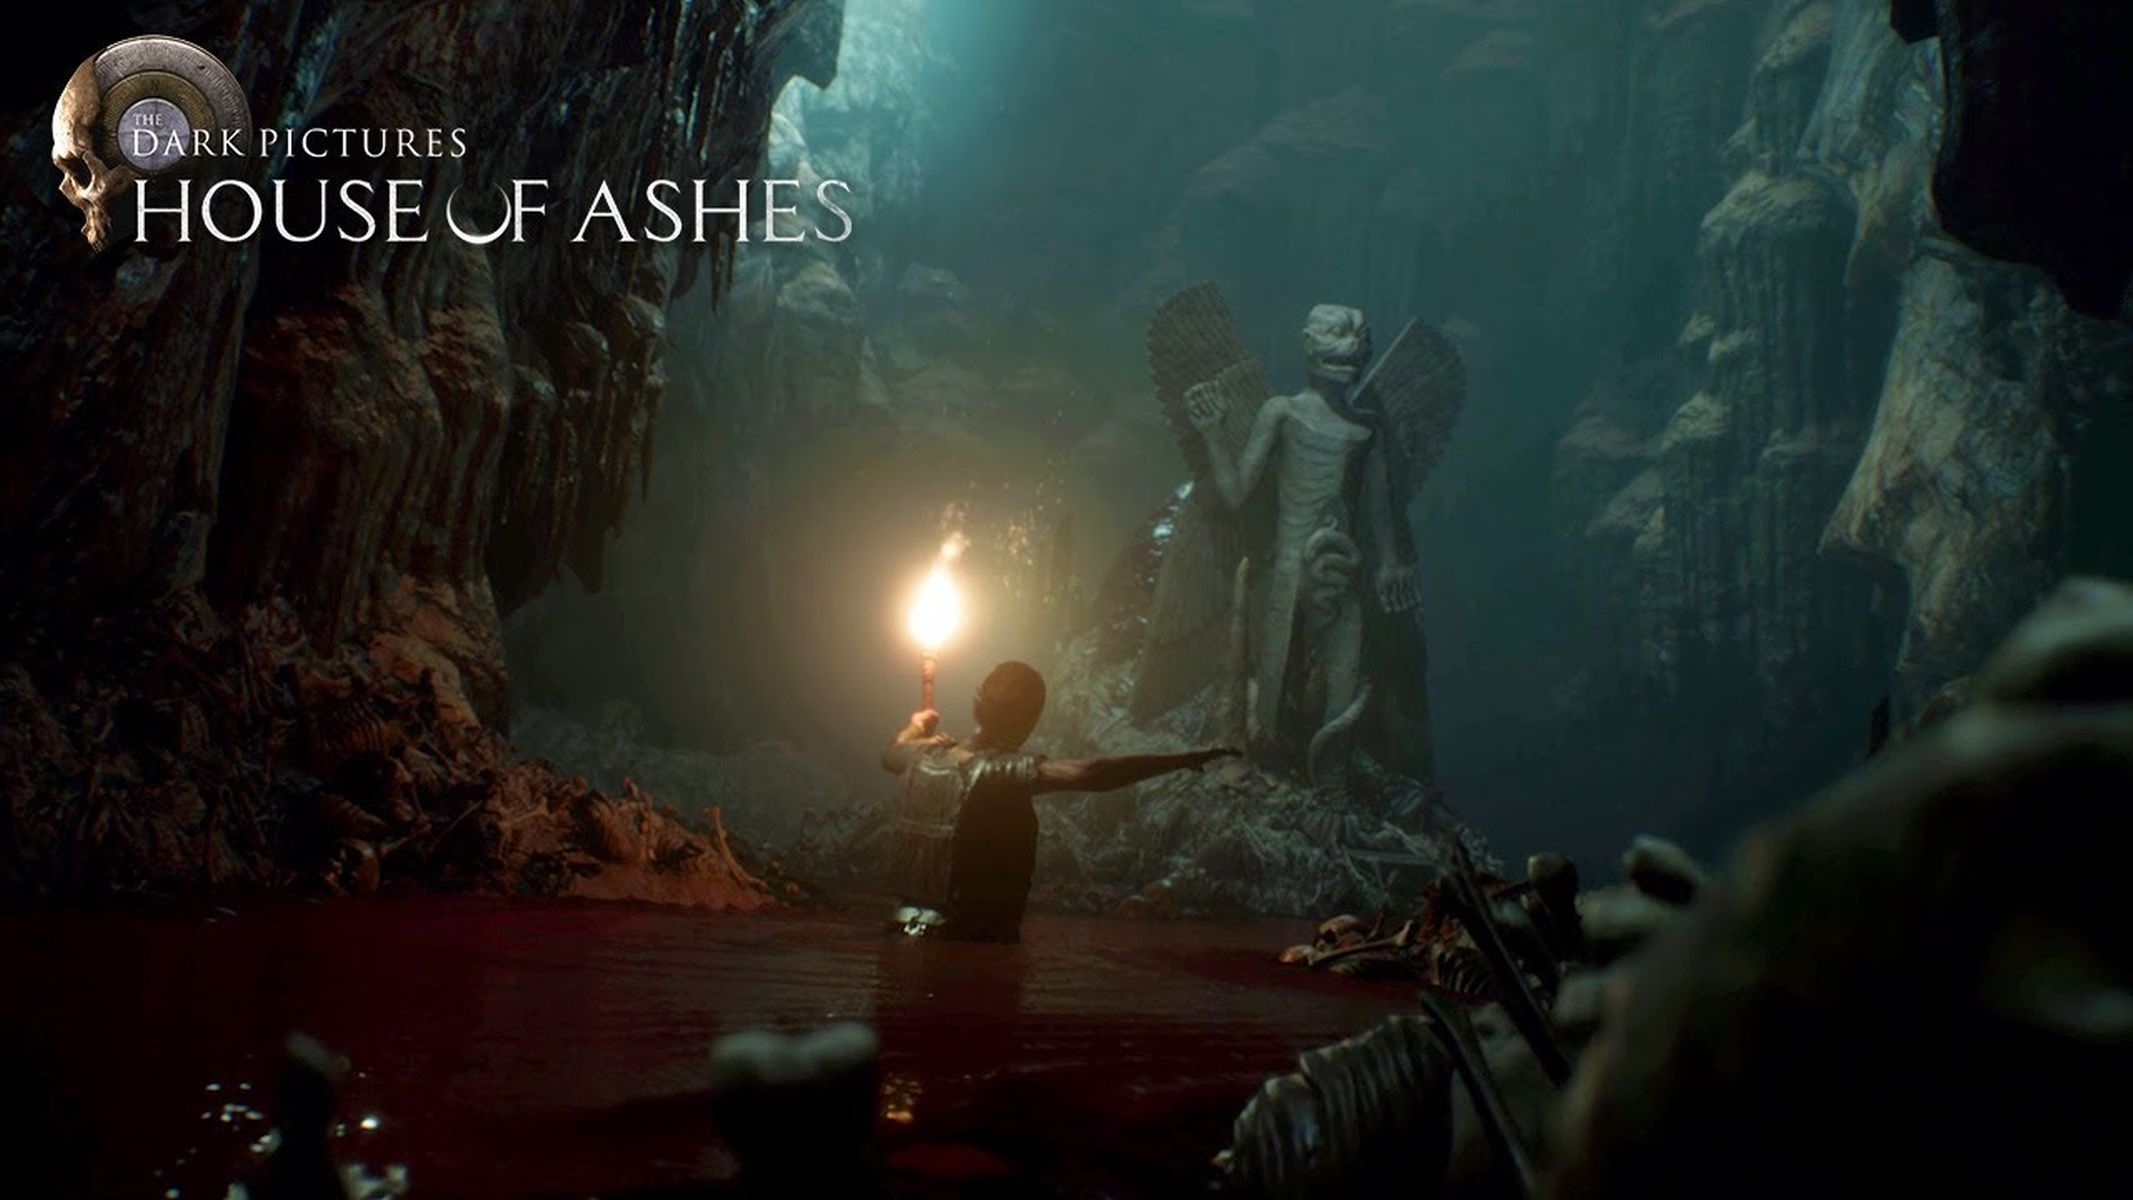 Horor The Dark Pictures Anthology: House of Ashes plnohodnotně představen